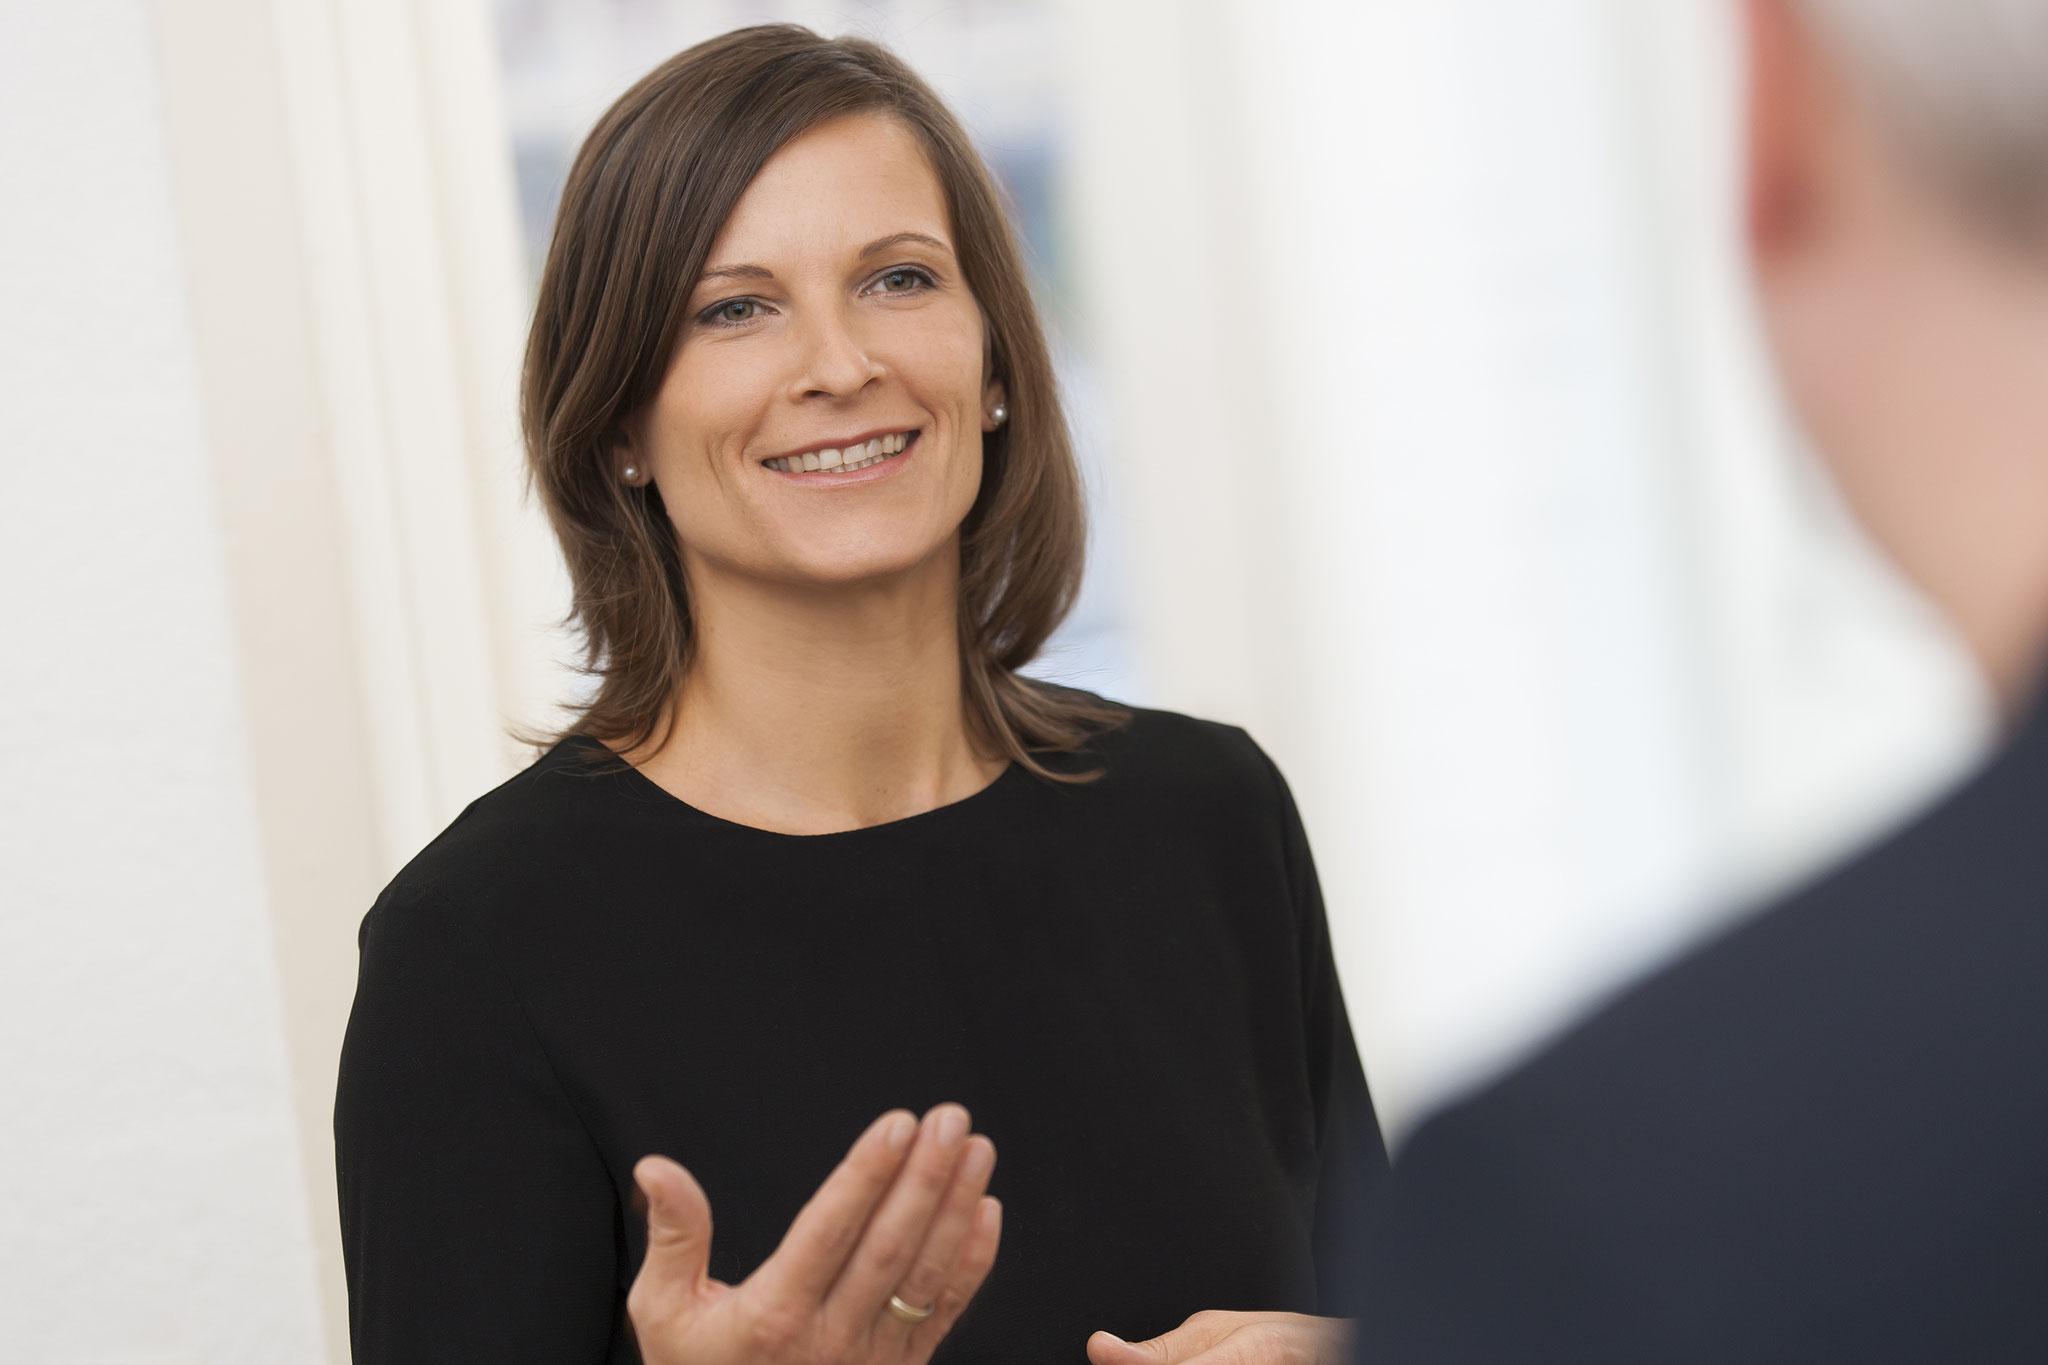 Stefanie Weber medius mediation bonn